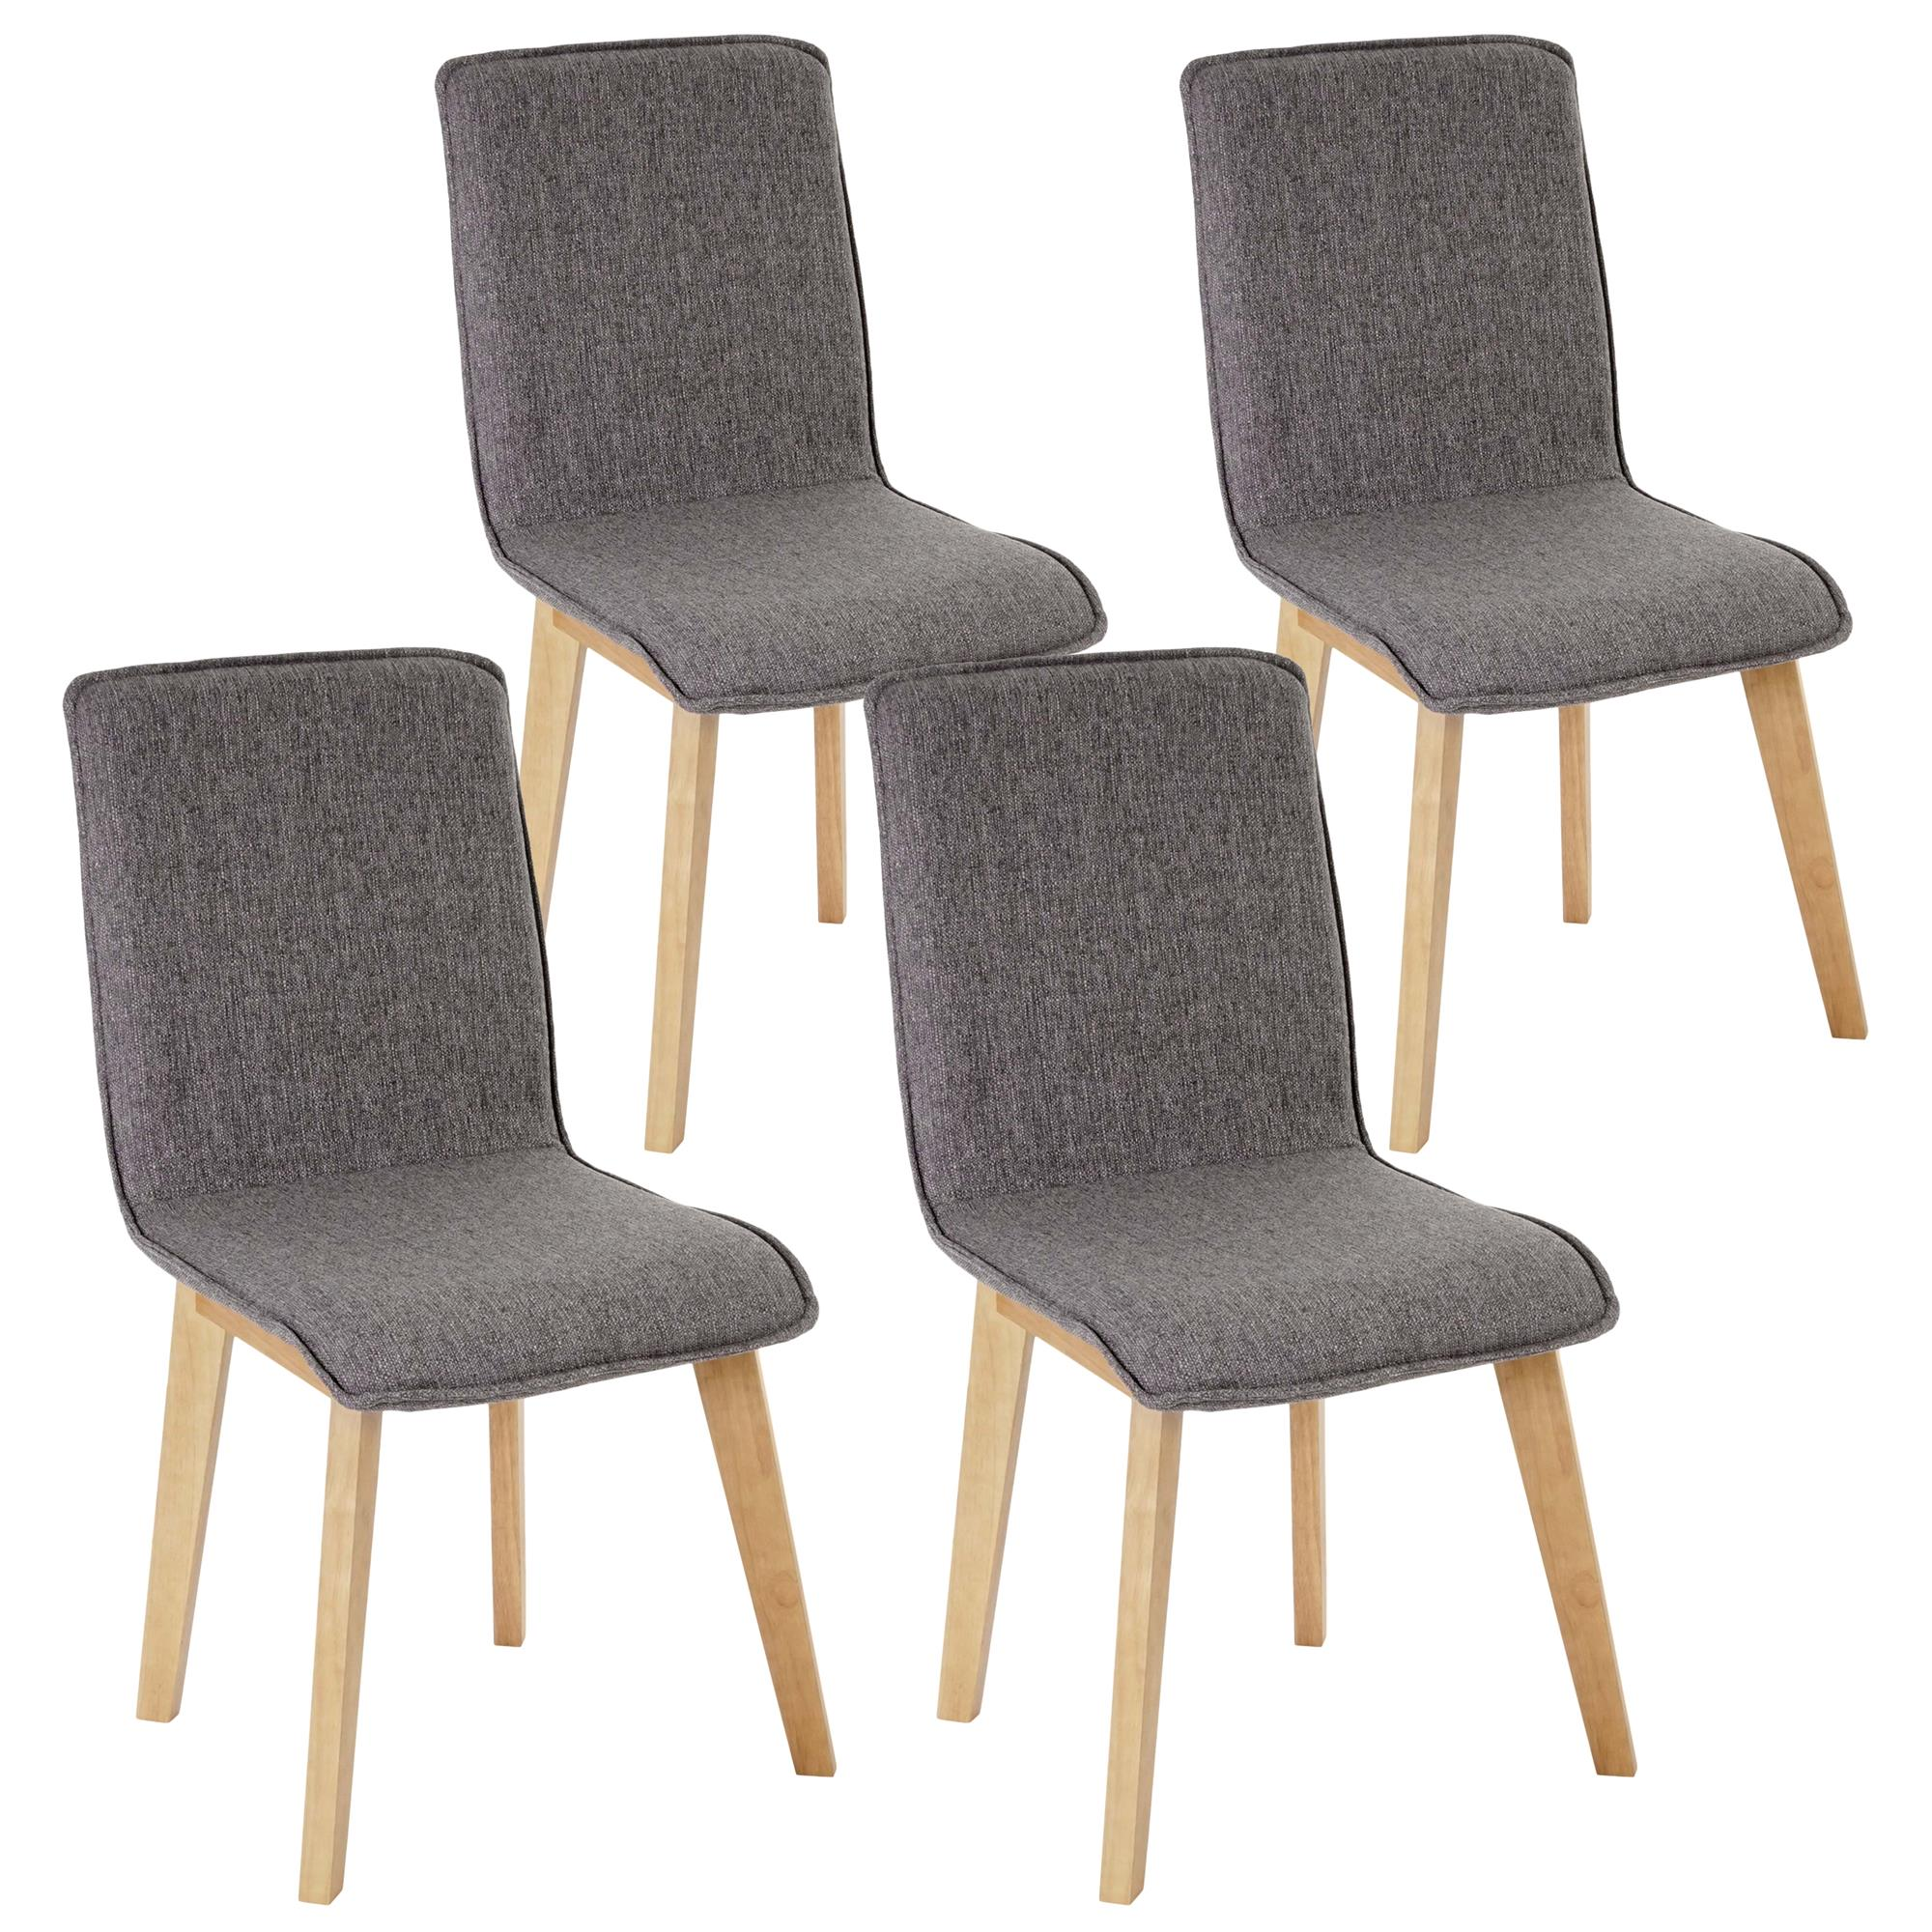 Lote 4 sillas de cocina o comedor ford en tela gris lote 4 sillas de cocina o comedor ford for Comedor 4 sillas madera